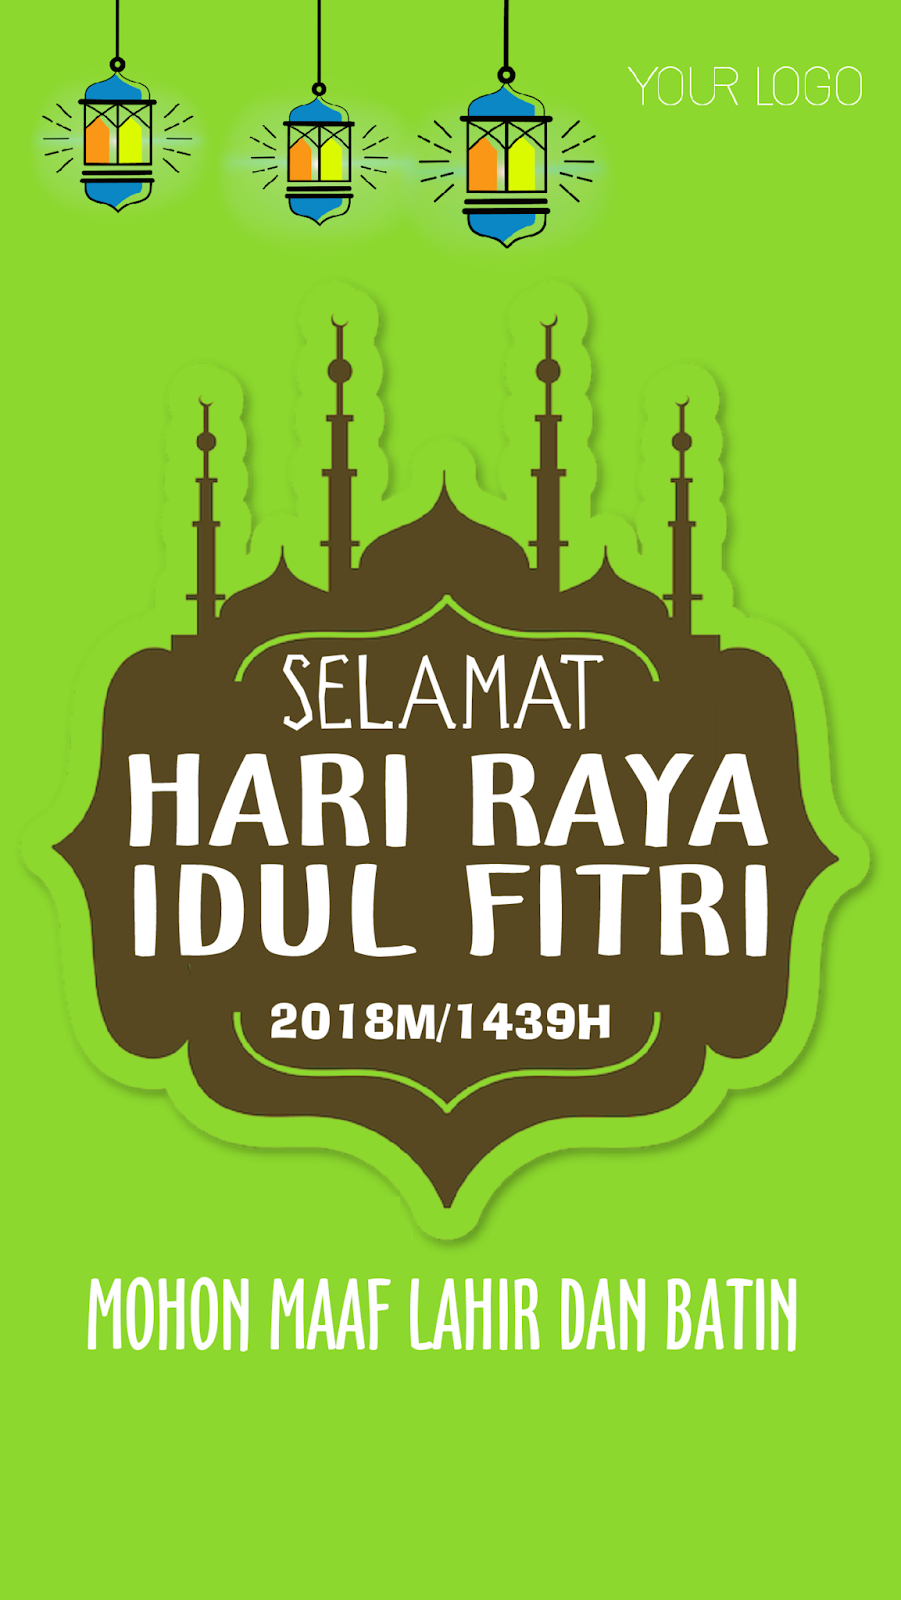 35 Ide Pamflet Idul Fitri Little Duckling Blog